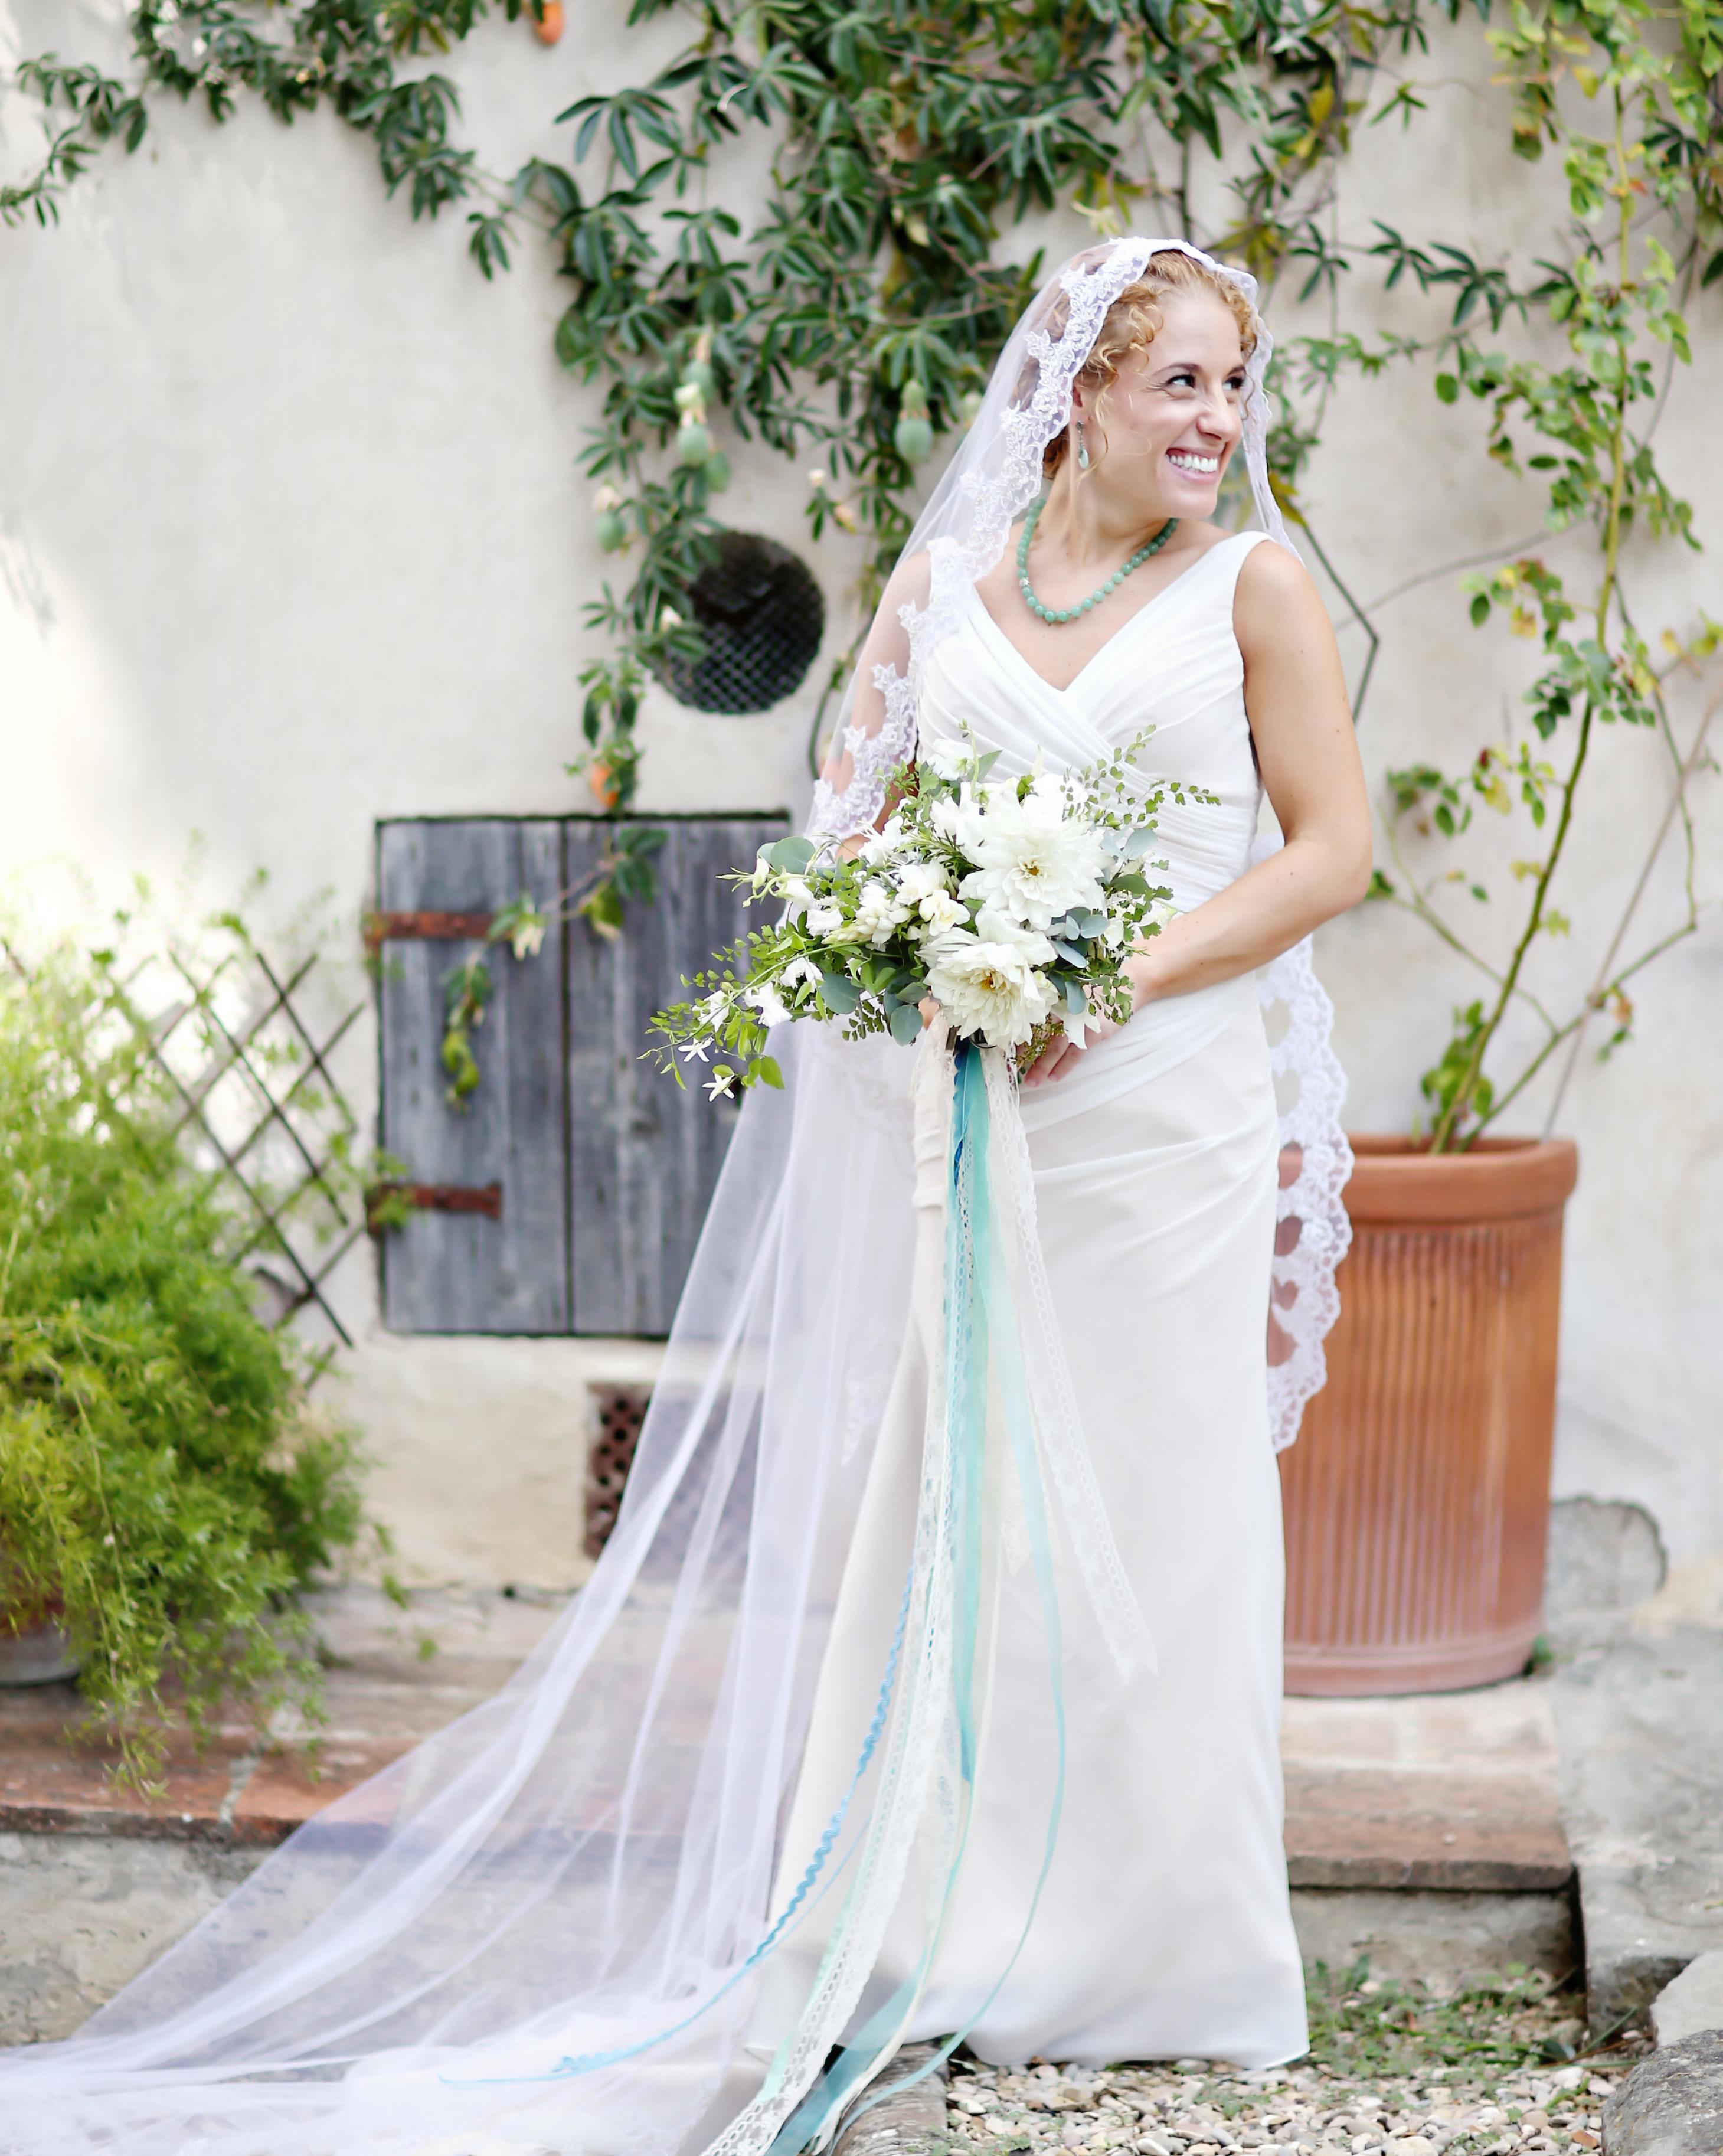 lindsay-andy-wedding-bride-1879-s111659-1114.jpg